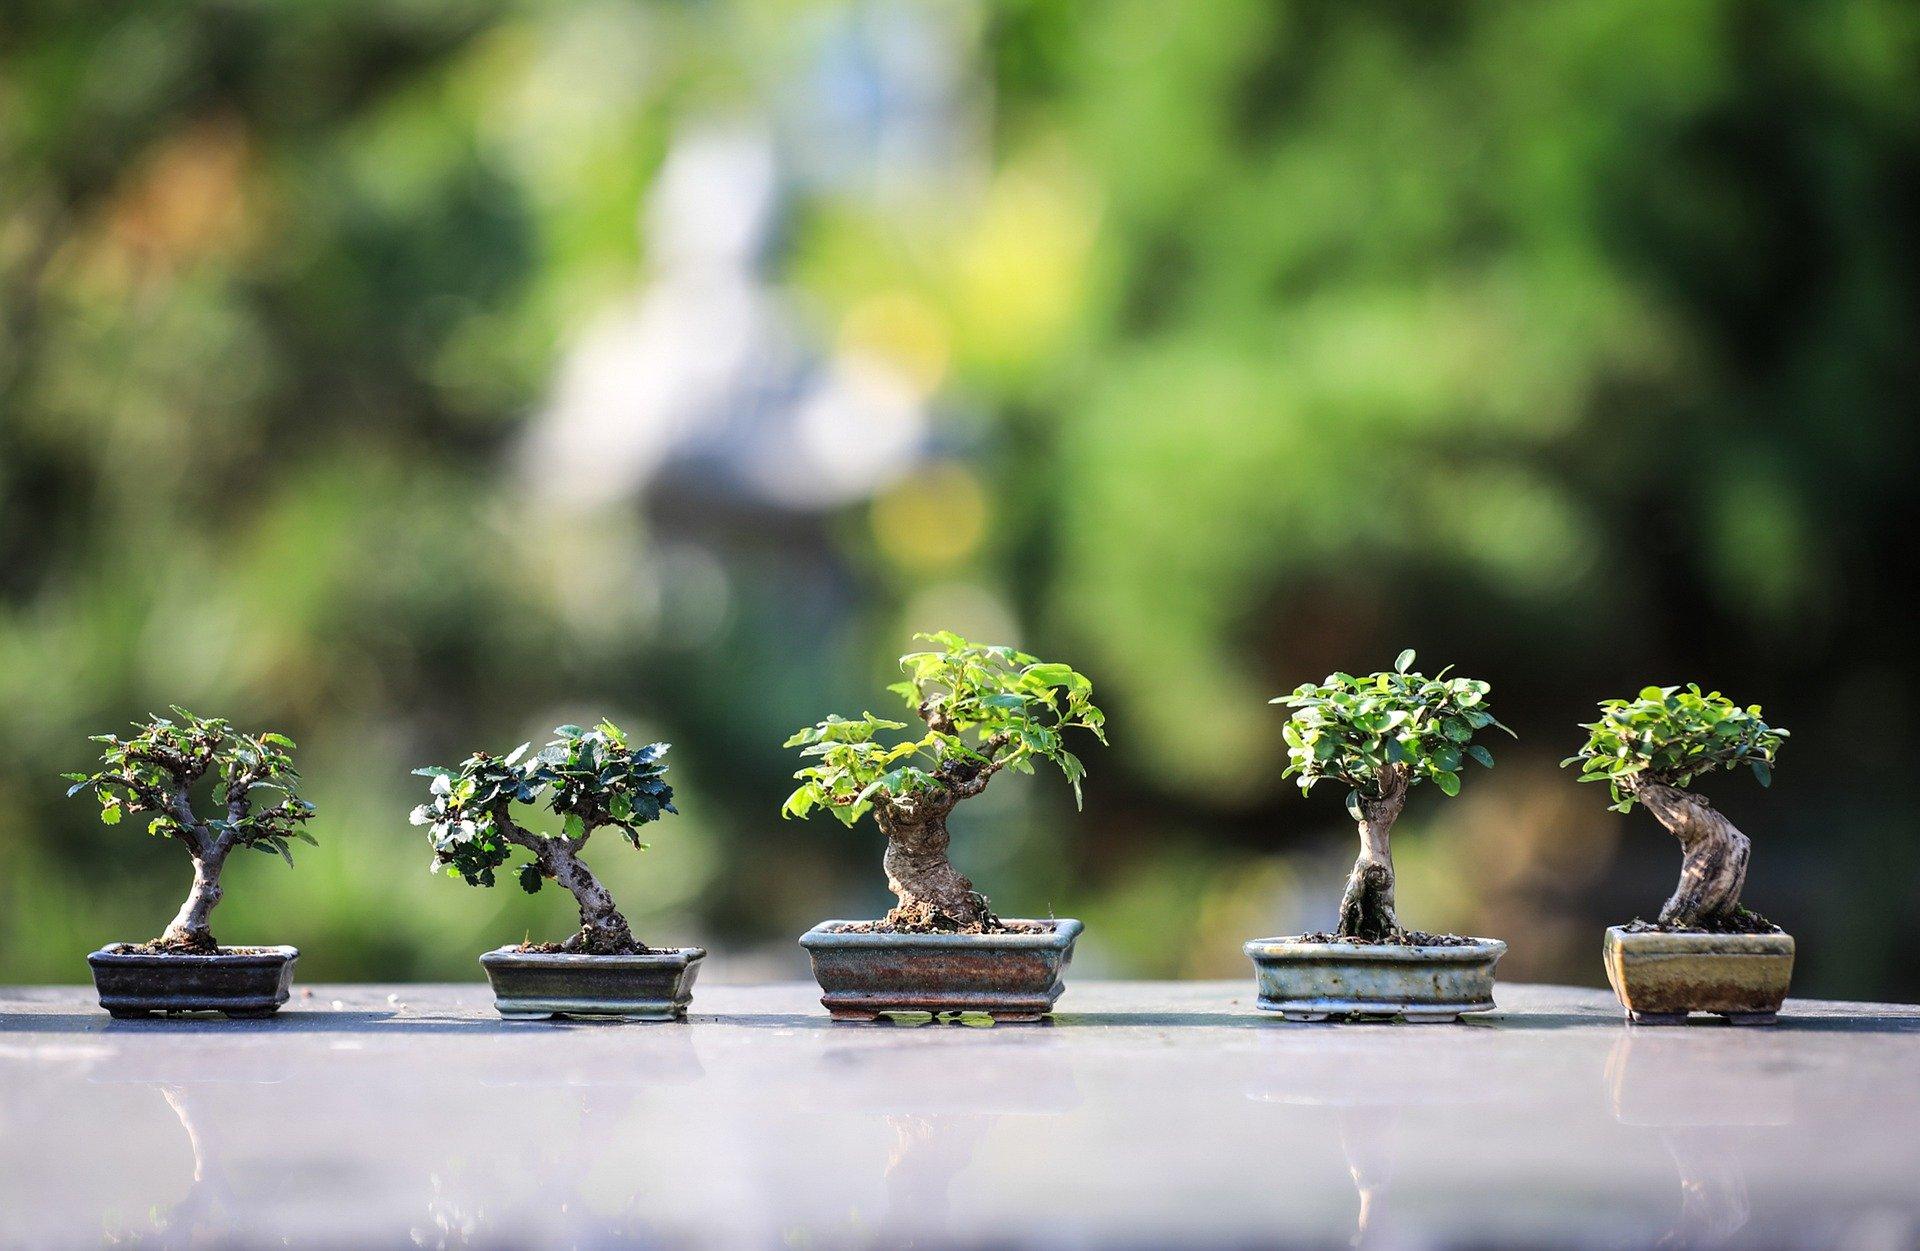 Ornamental Plants and Bonsai